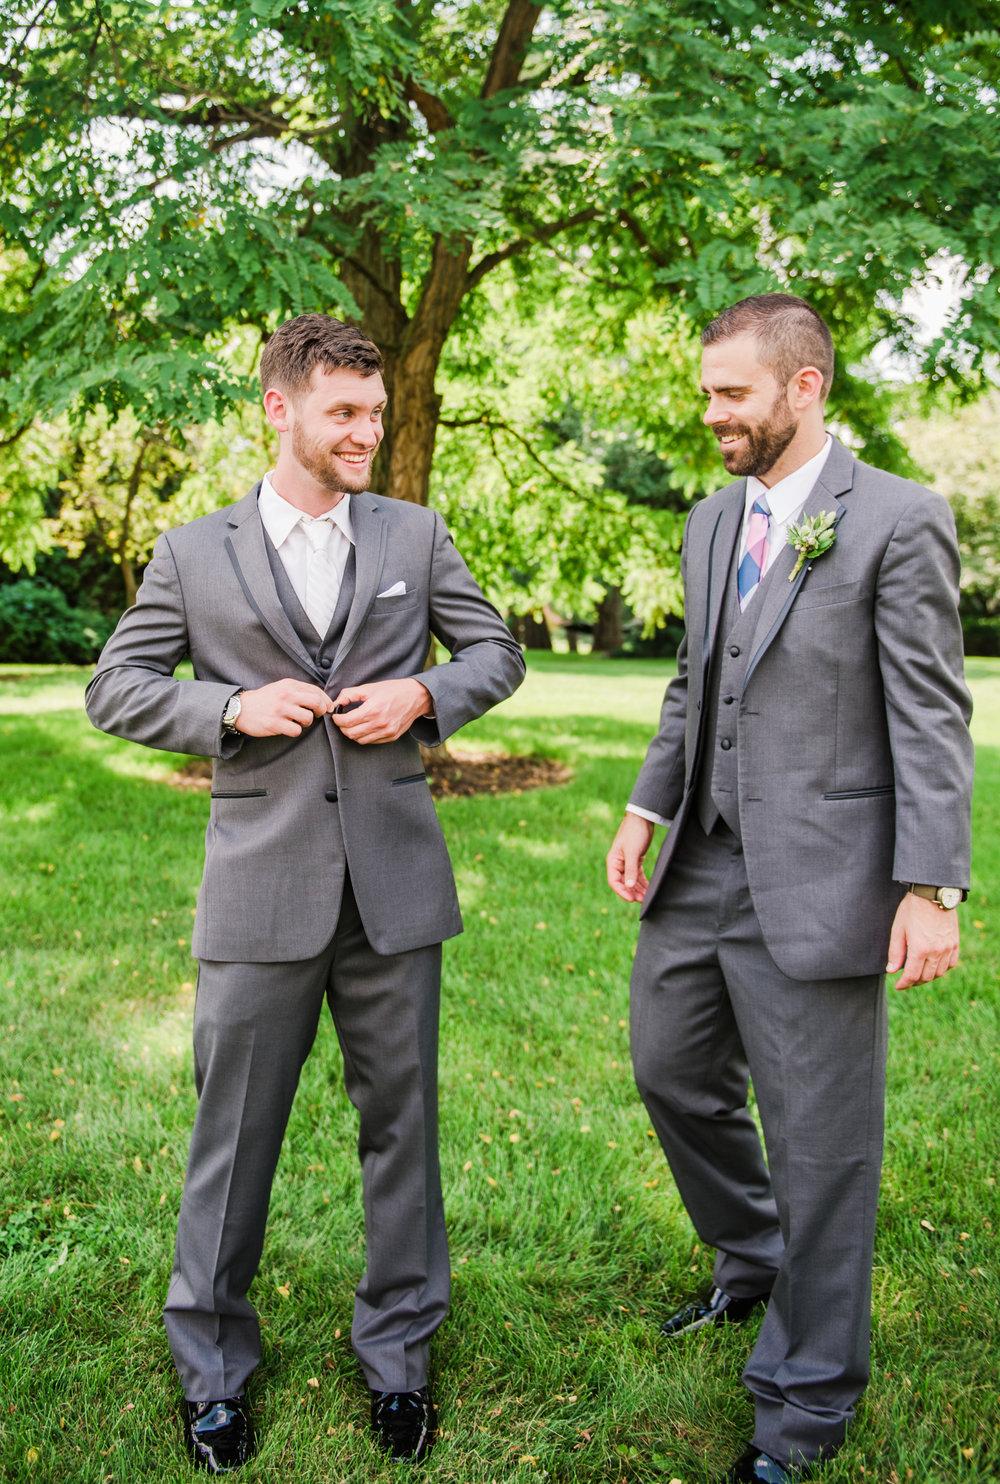 Jerris_Wadsworth_Wedding_Barn_Rochester_Wedding_JILL_STUDIO_Rochester_NY_Photographer_DSC_2231.jpg